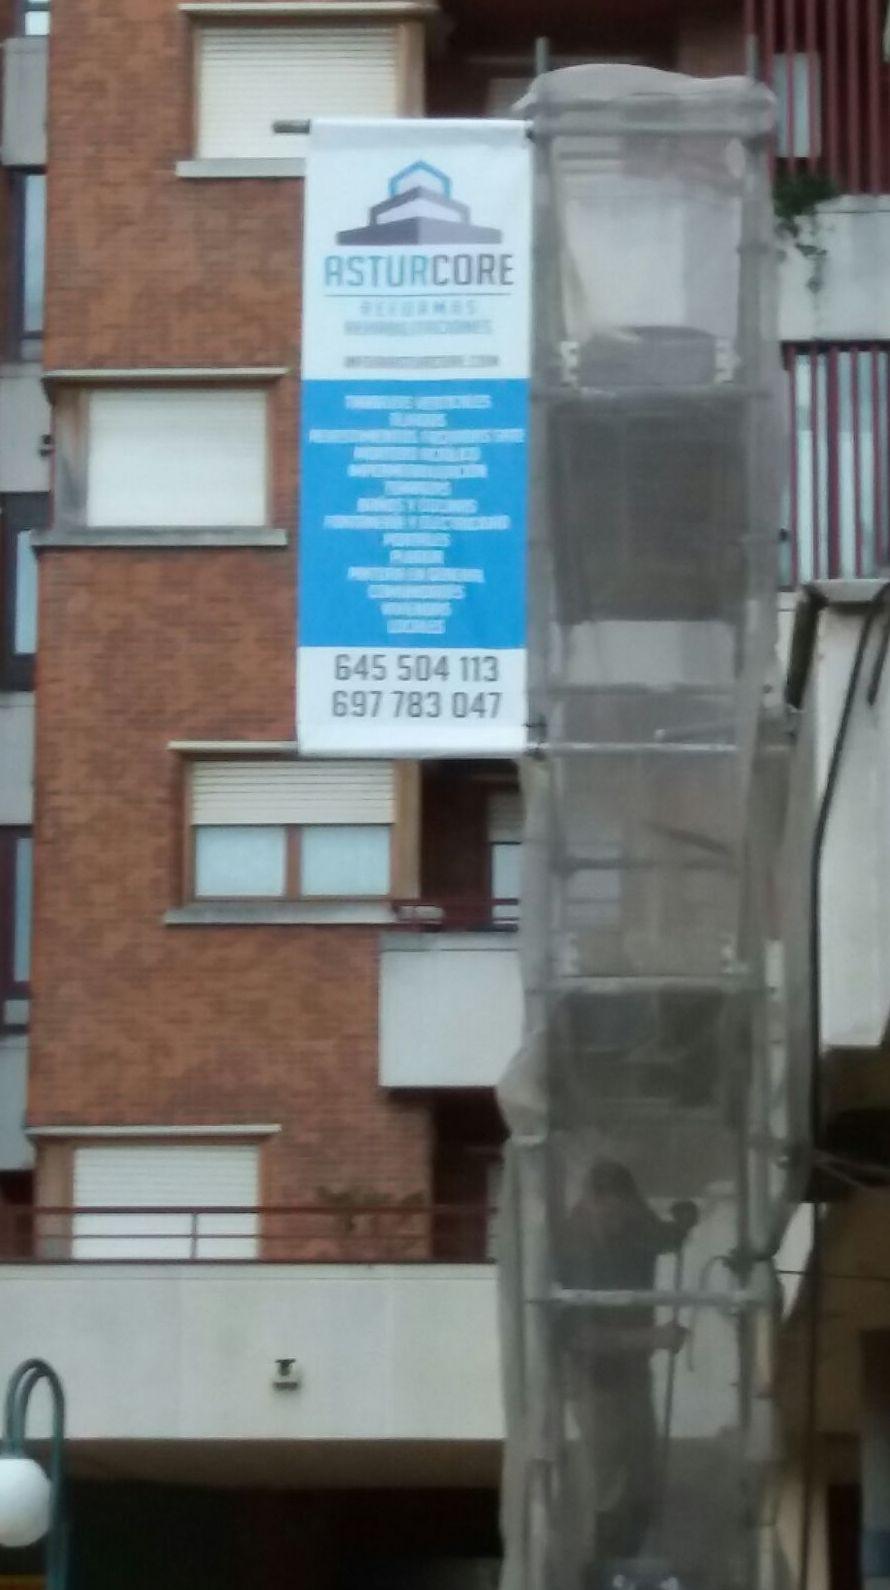 Foto 18 de Empresa de reformas en Oviedo | Asturcore